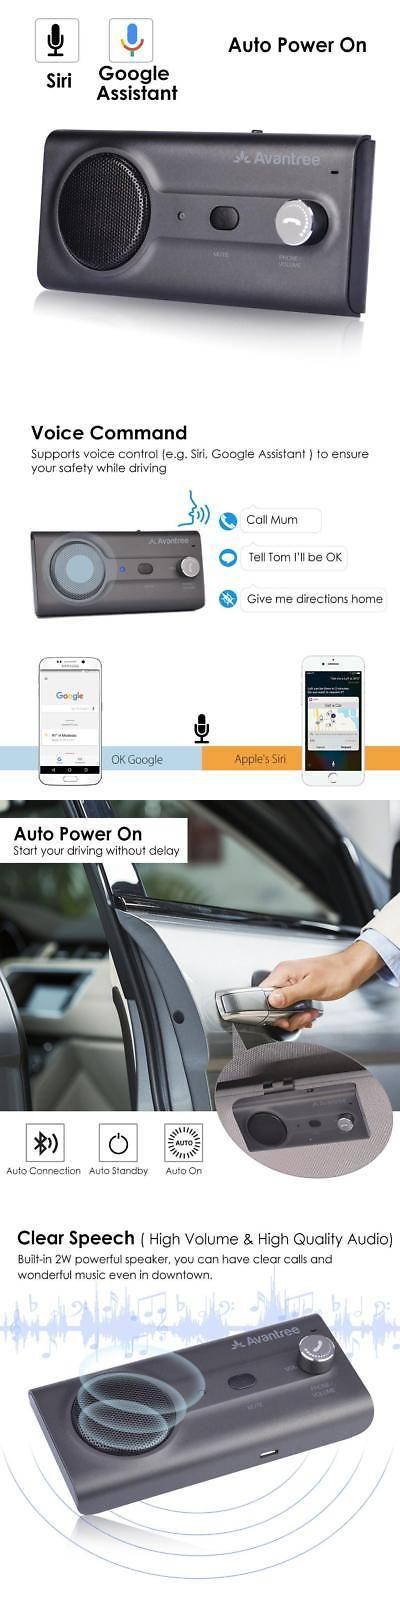 Car Speakerphones 88468: 2018 Avantree Ck11 Bluetooth Hands